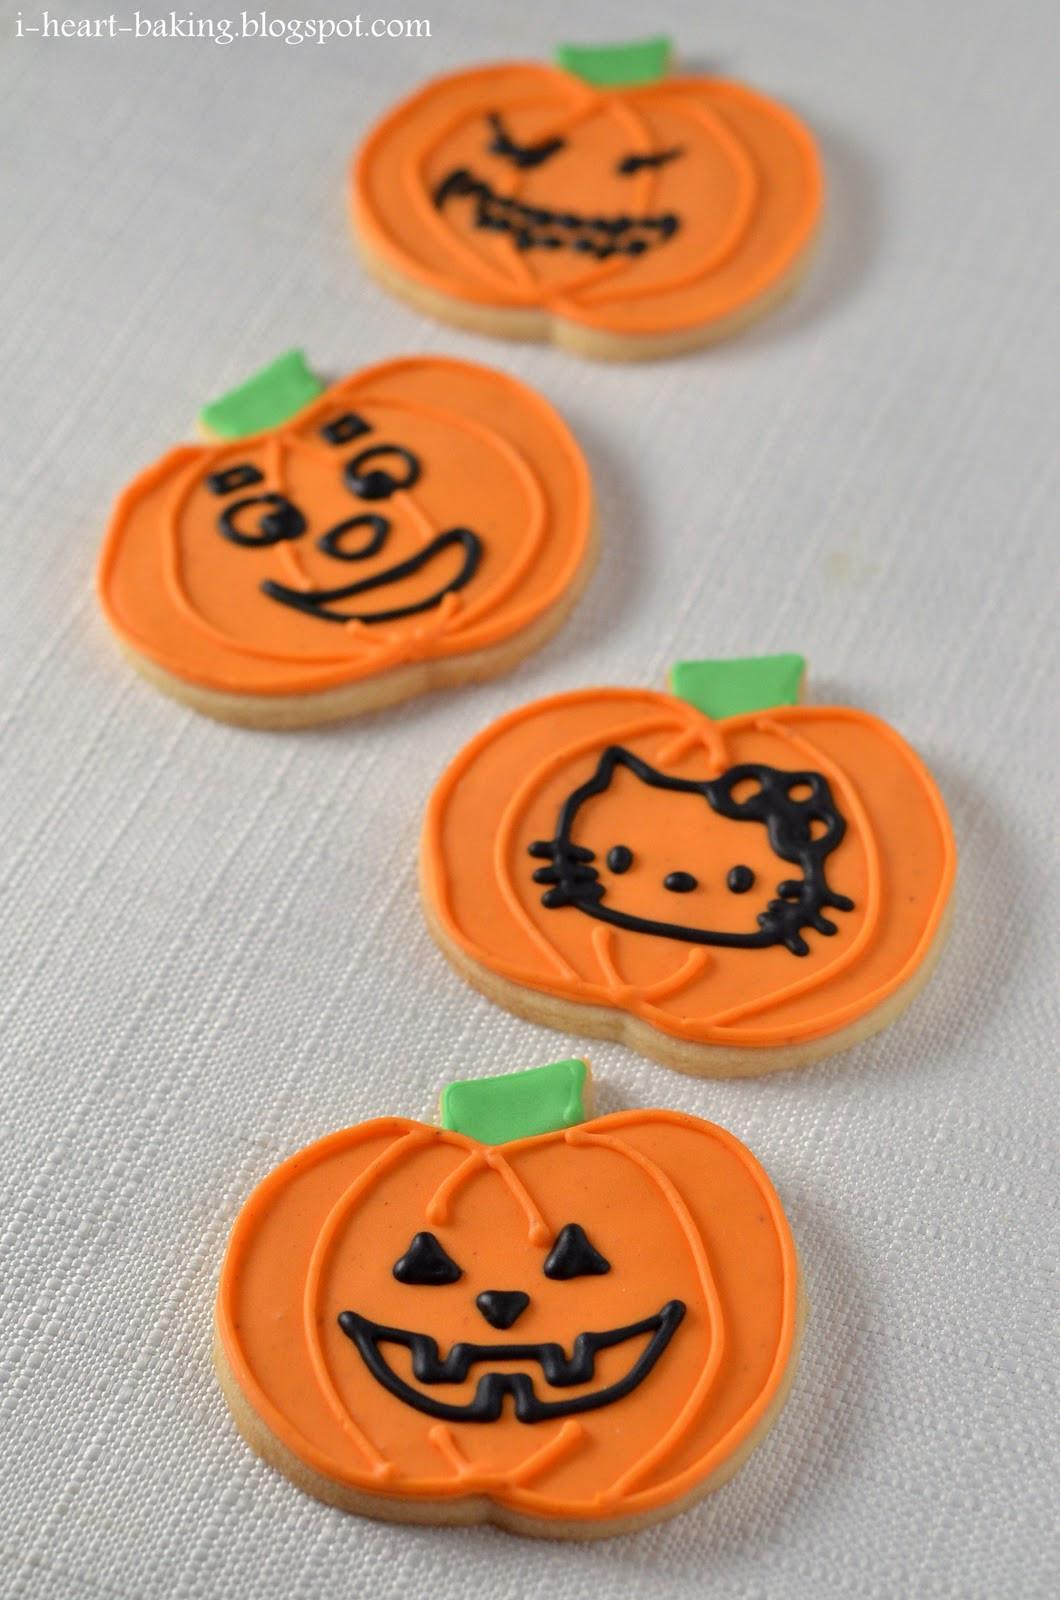 Halloween Pumpkin Cookies  i heart baking halloween cookies jack o lantern